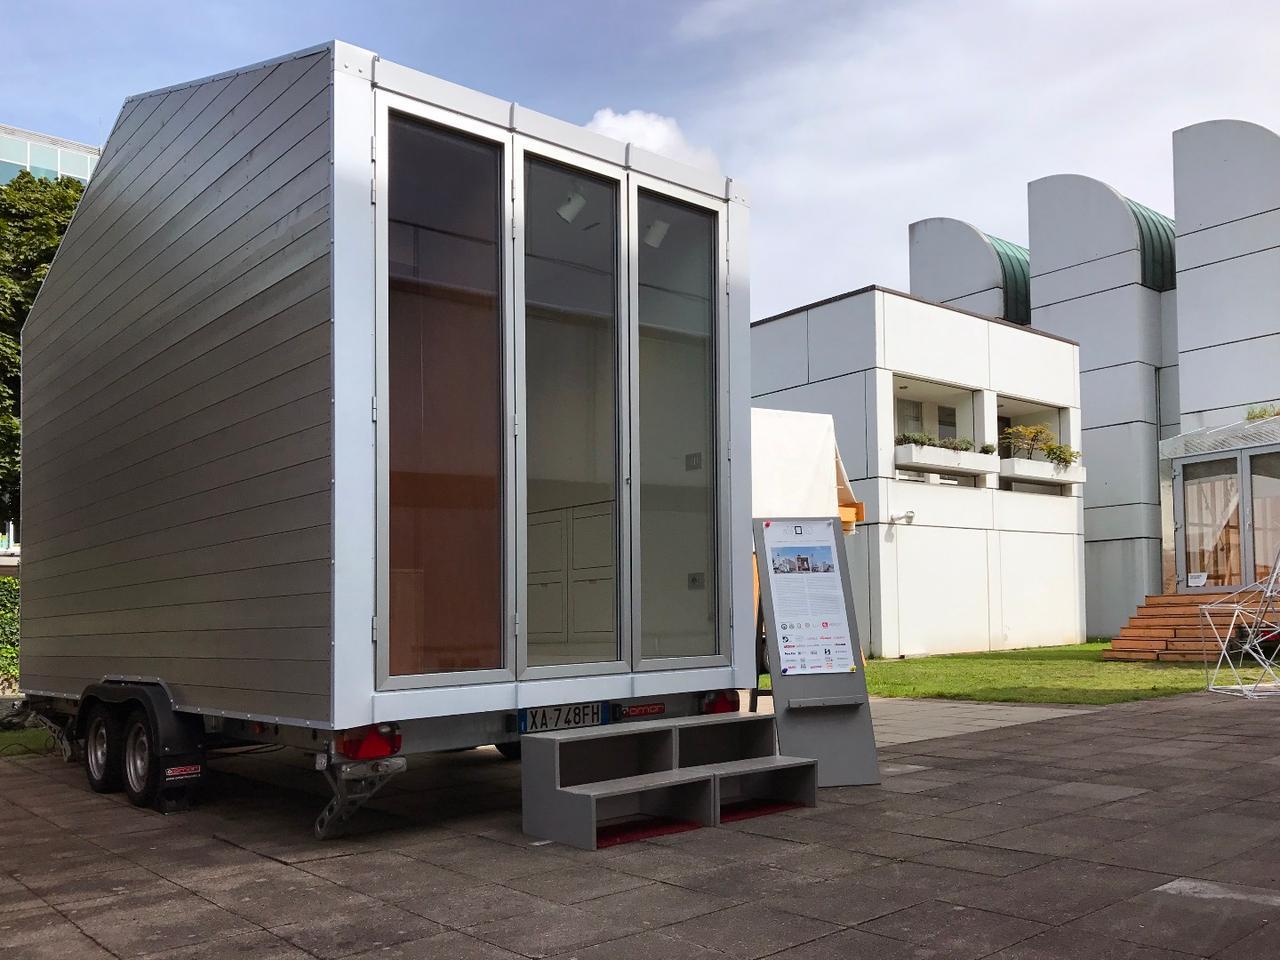 Berlin- based Italian architect and engineer Leonardo Di Chiara designed and built the prototype aVOID tiny house